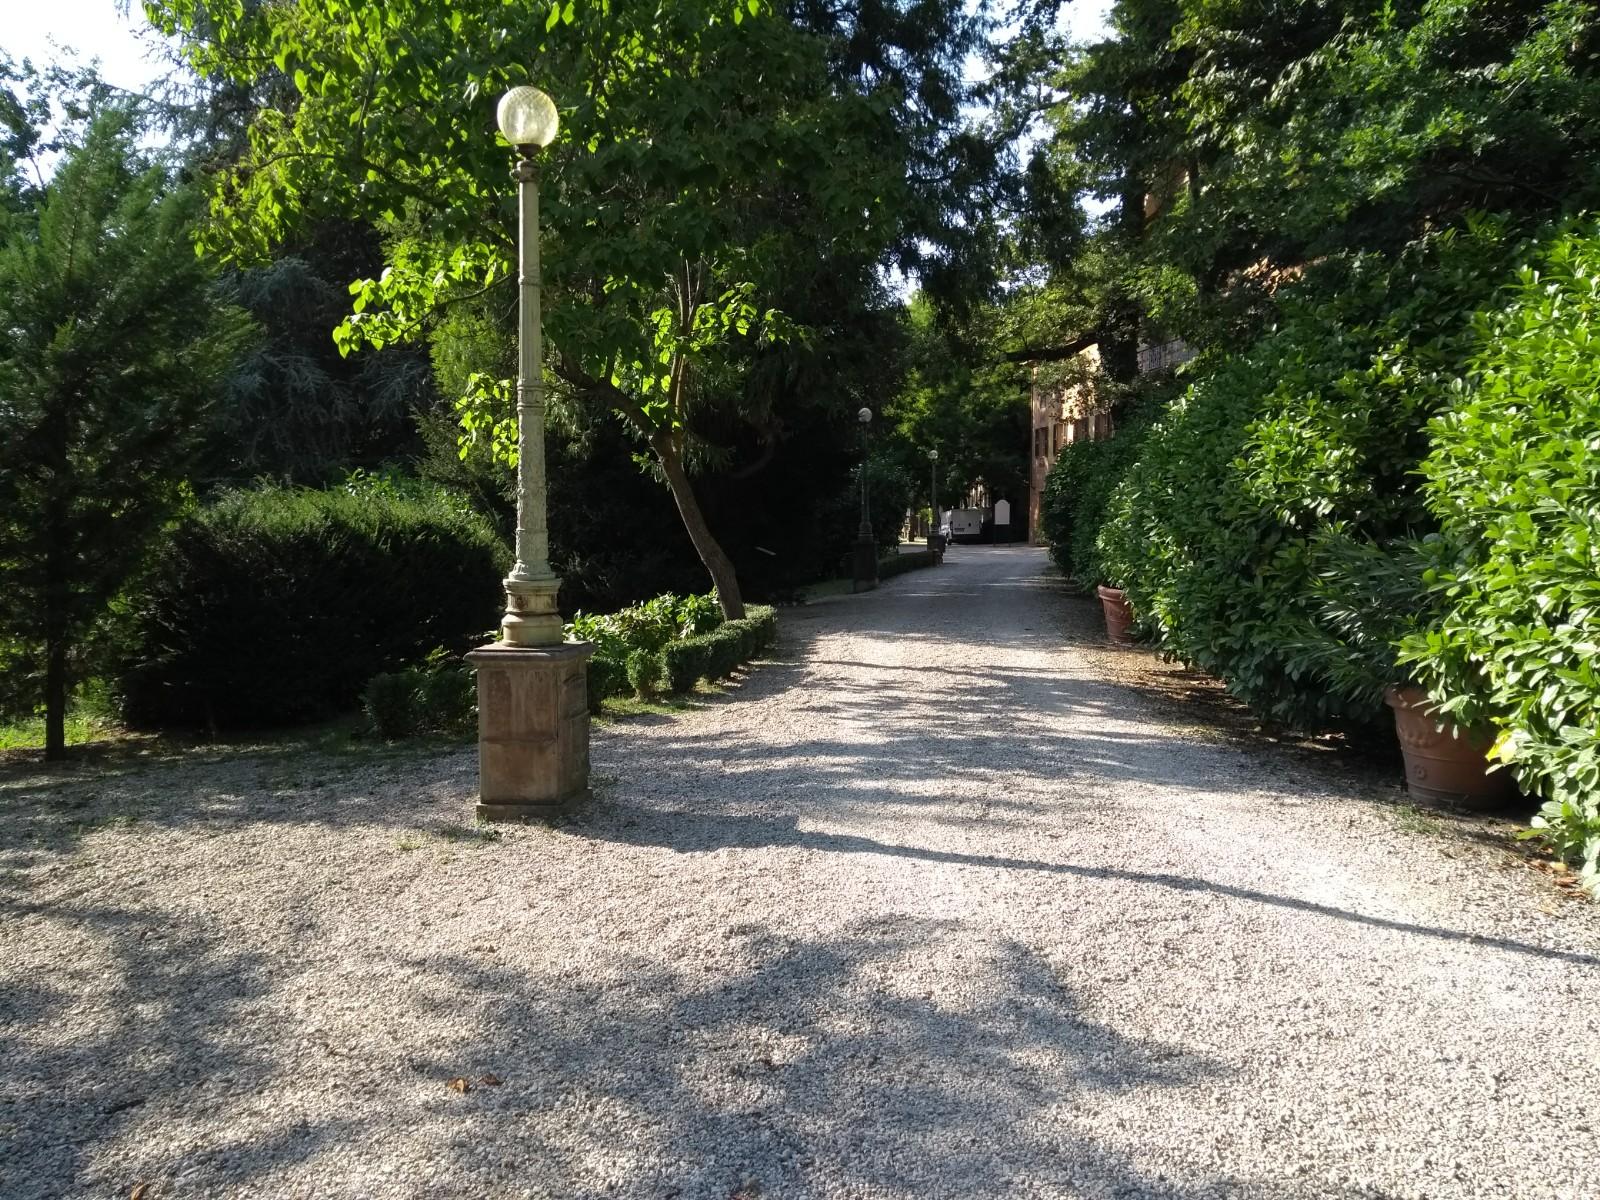 Palo ottocentesco in ghisa fuso dalla Balleydier Freres, Parco di Fontanafredda (CN)